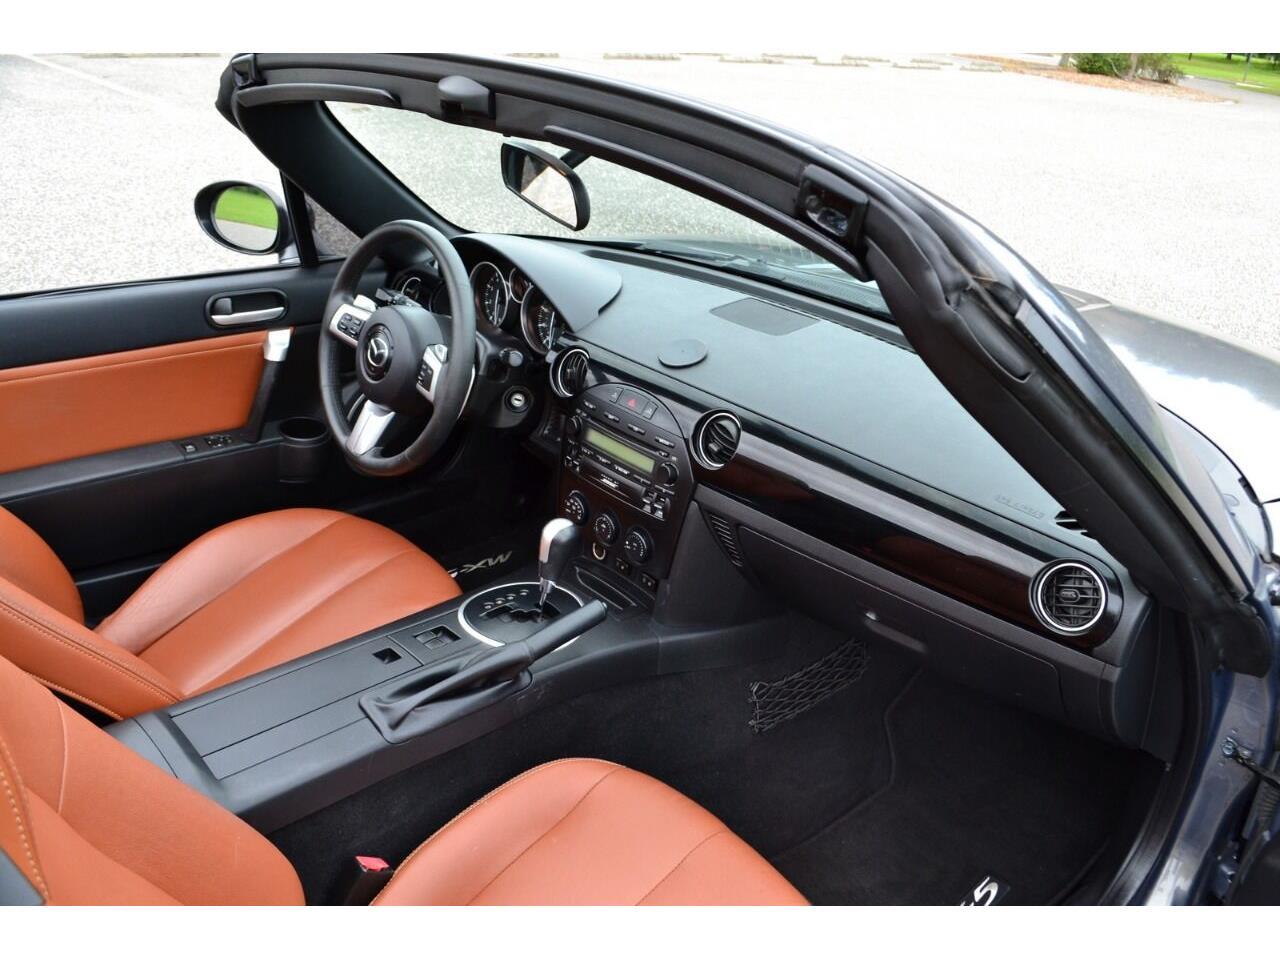 2008 Mazda Miata (CC-1417091) for sale in Clearwater, Florida